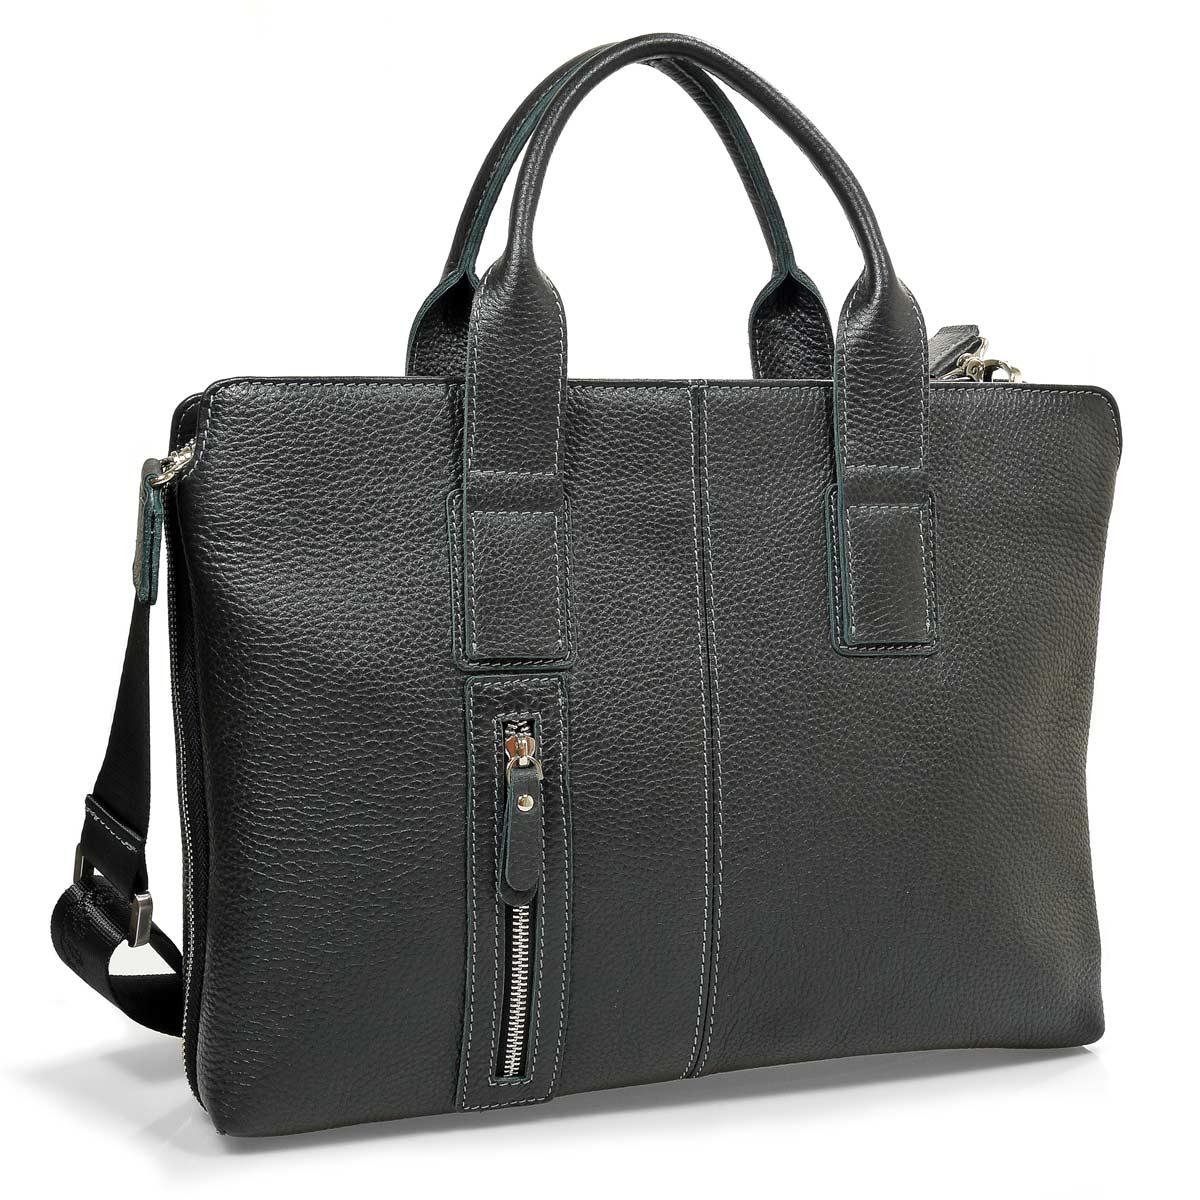 102-288-1 Briefcase Male Пеллекон